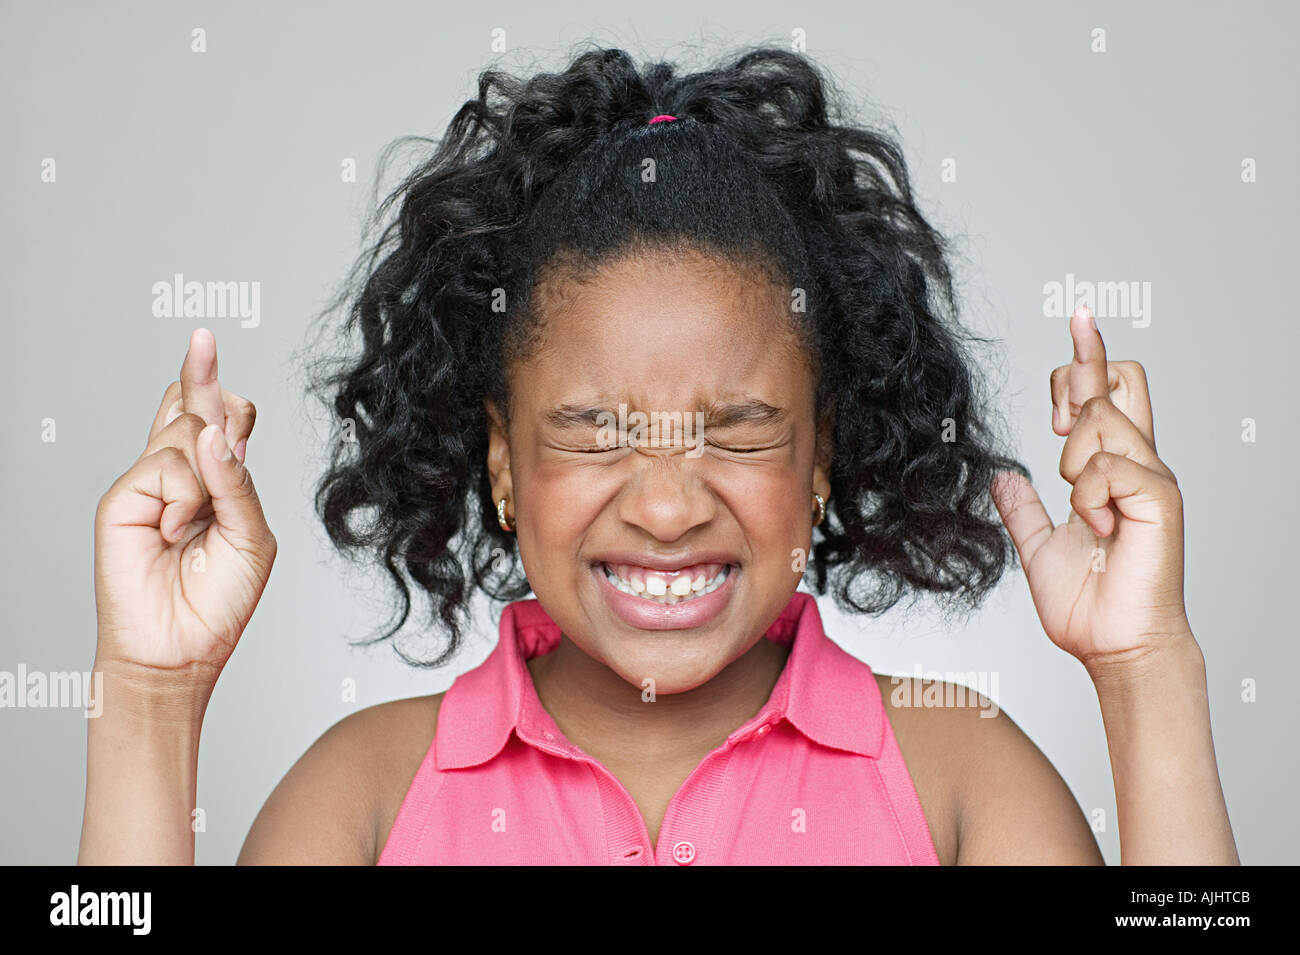 Fingers Crossed Child Stock Photos Fingers Crossed Child Stock